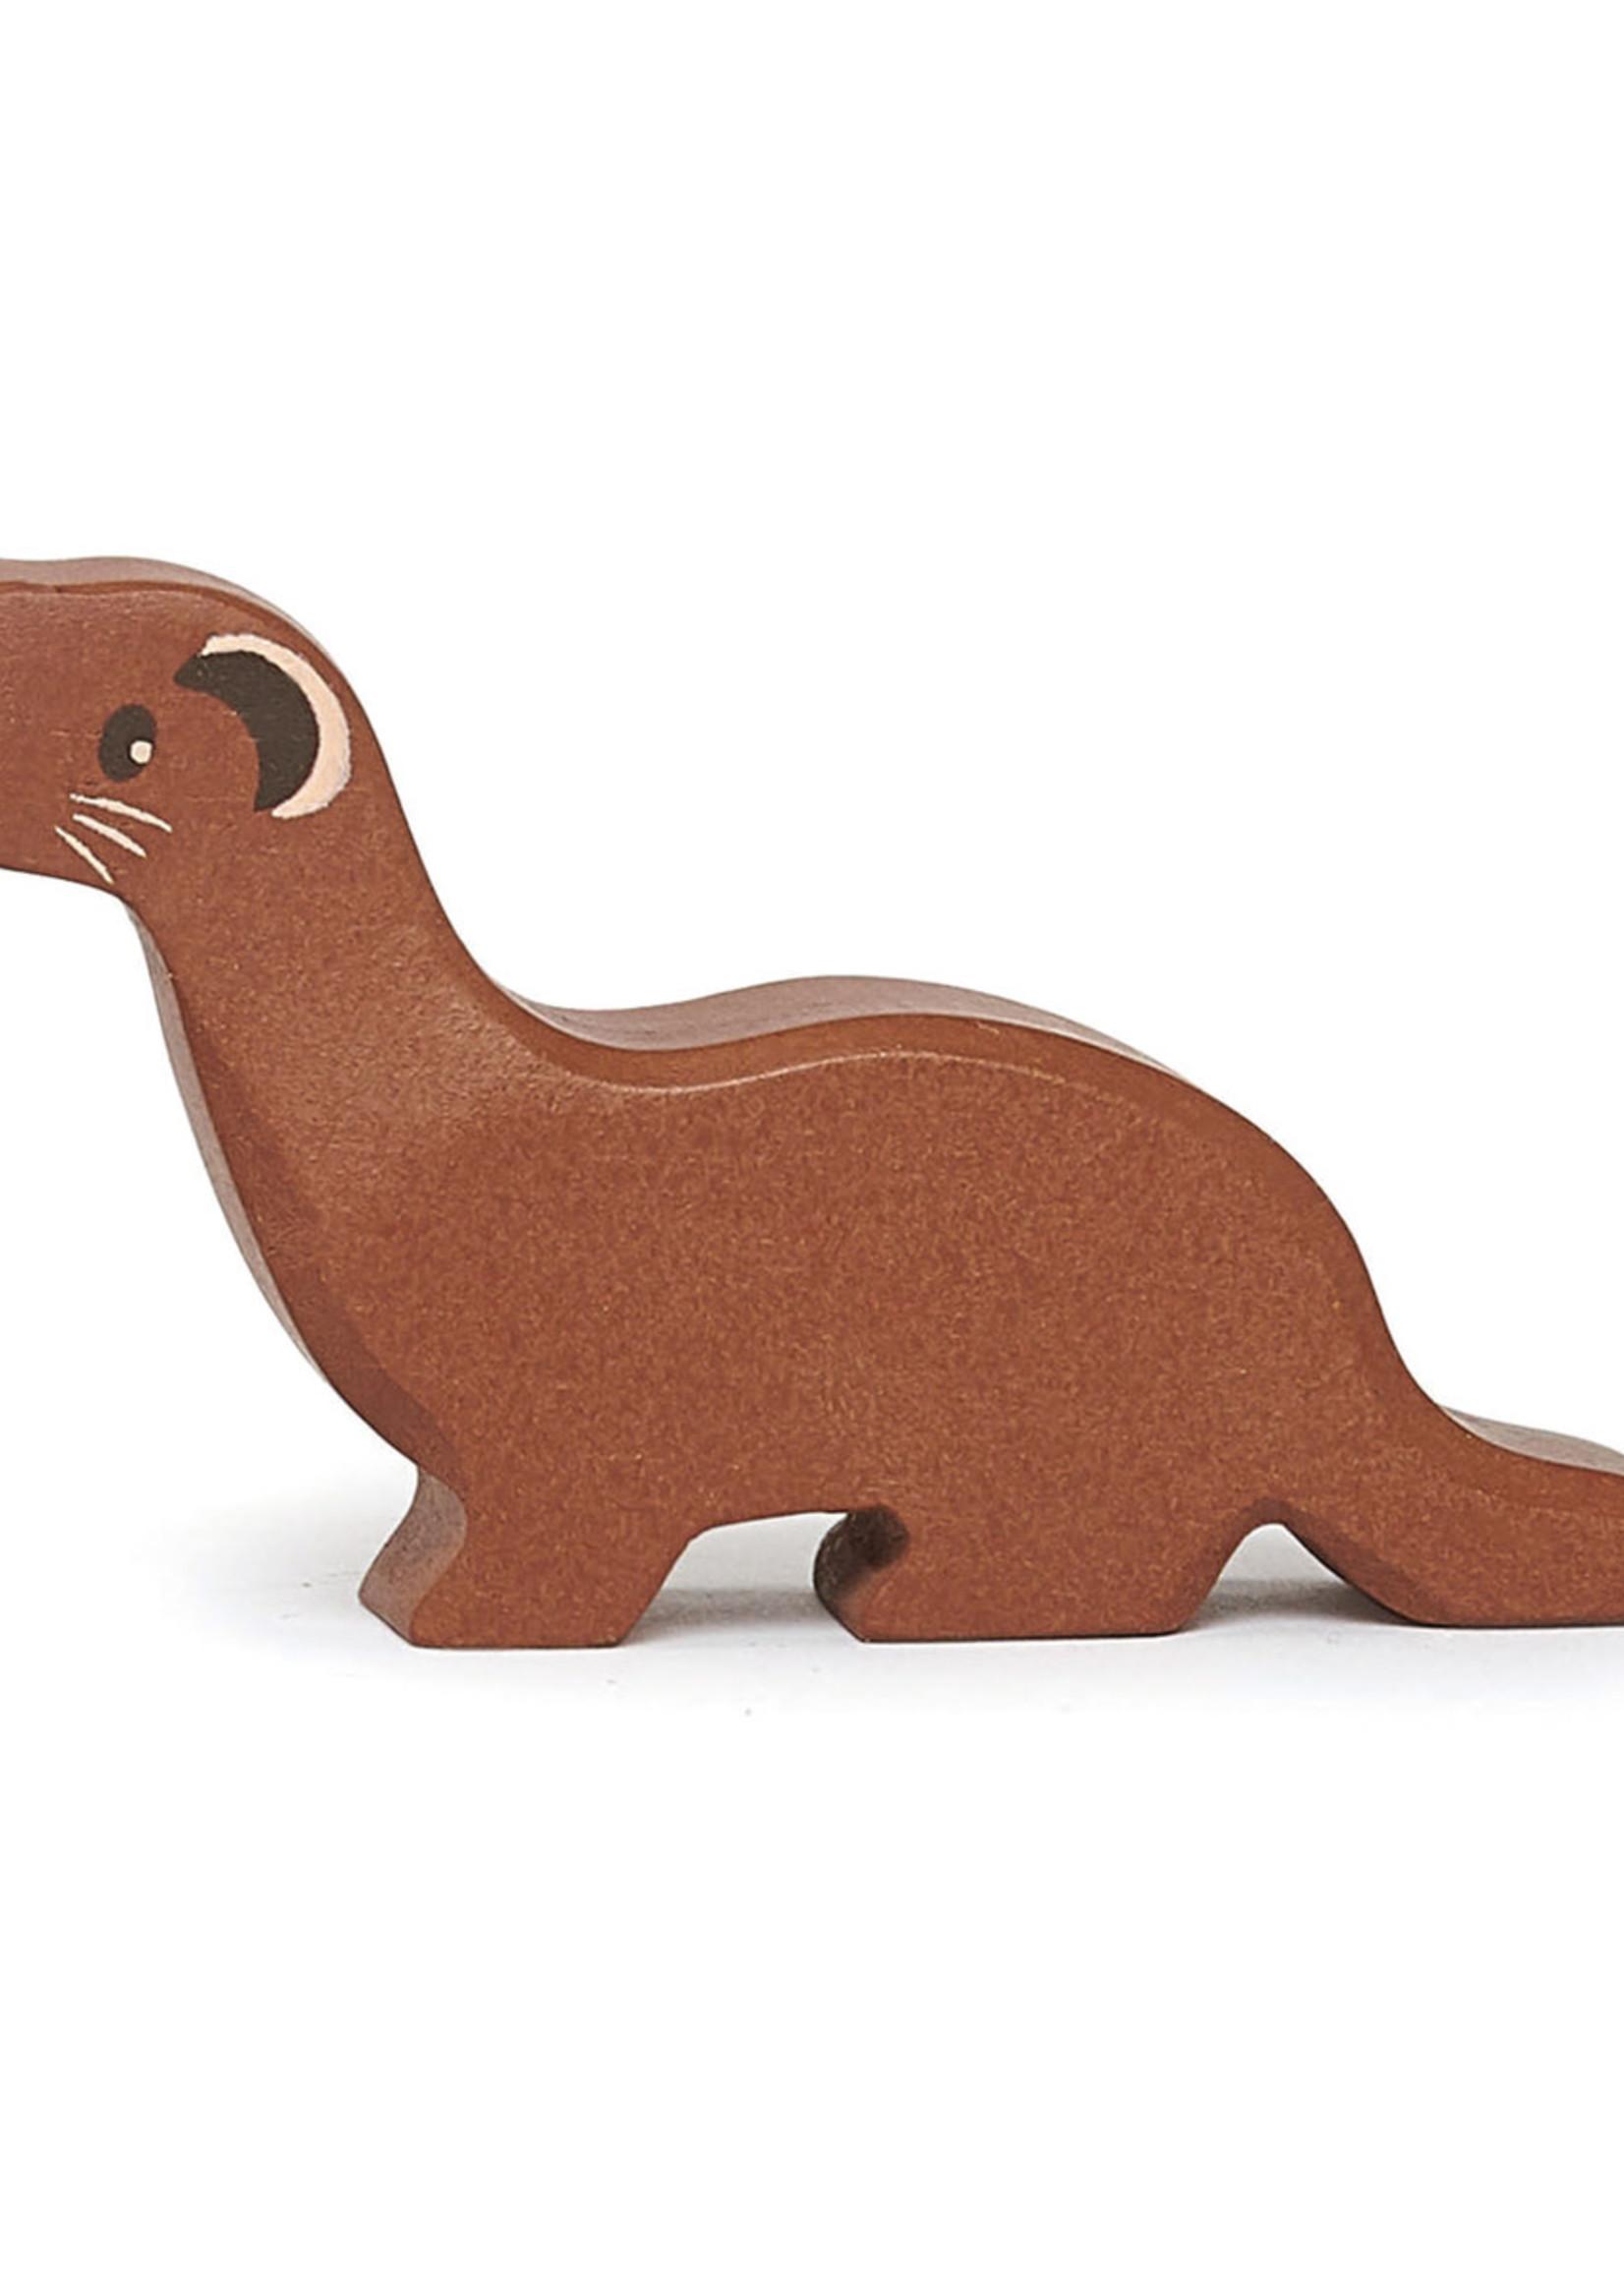 Tender Leaf Toys Woodland Animal Weasel